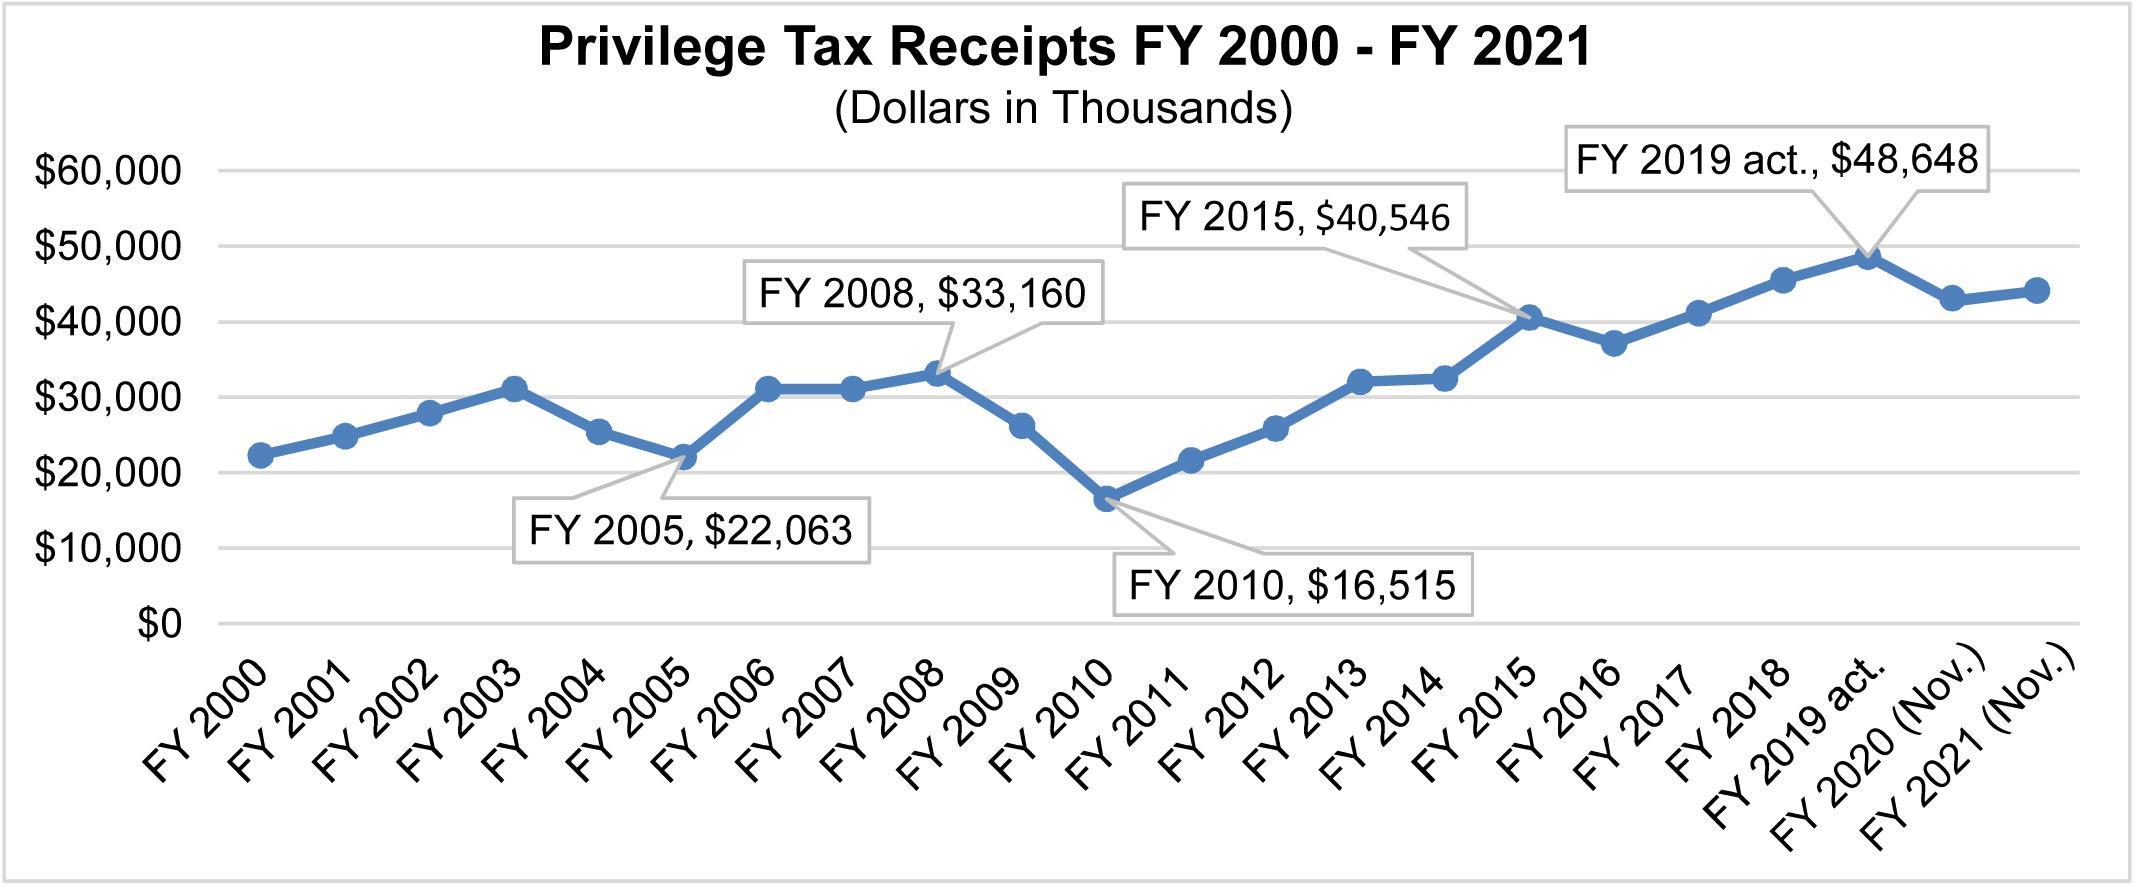 Privilege Tax Receipts FY 2000 - FY 2021